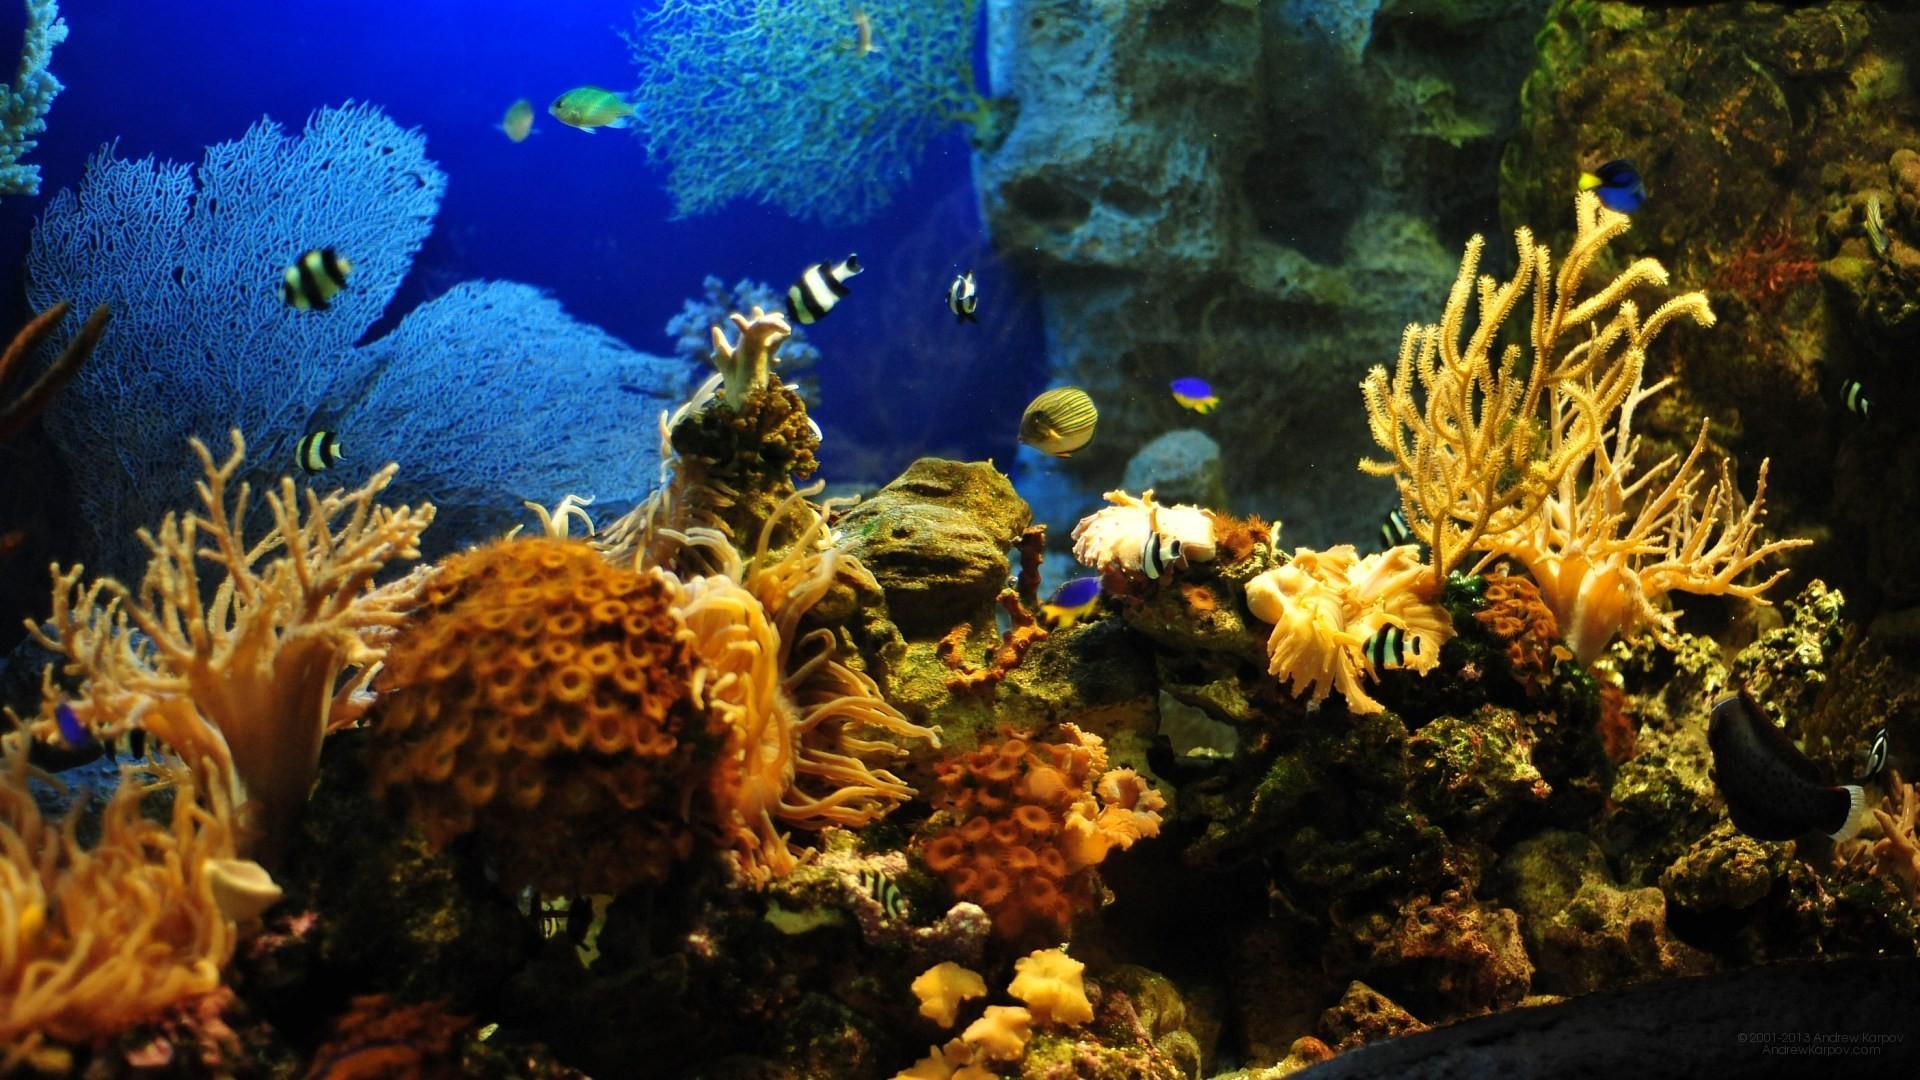 Animated aquarium wallpaper free download – photo#24